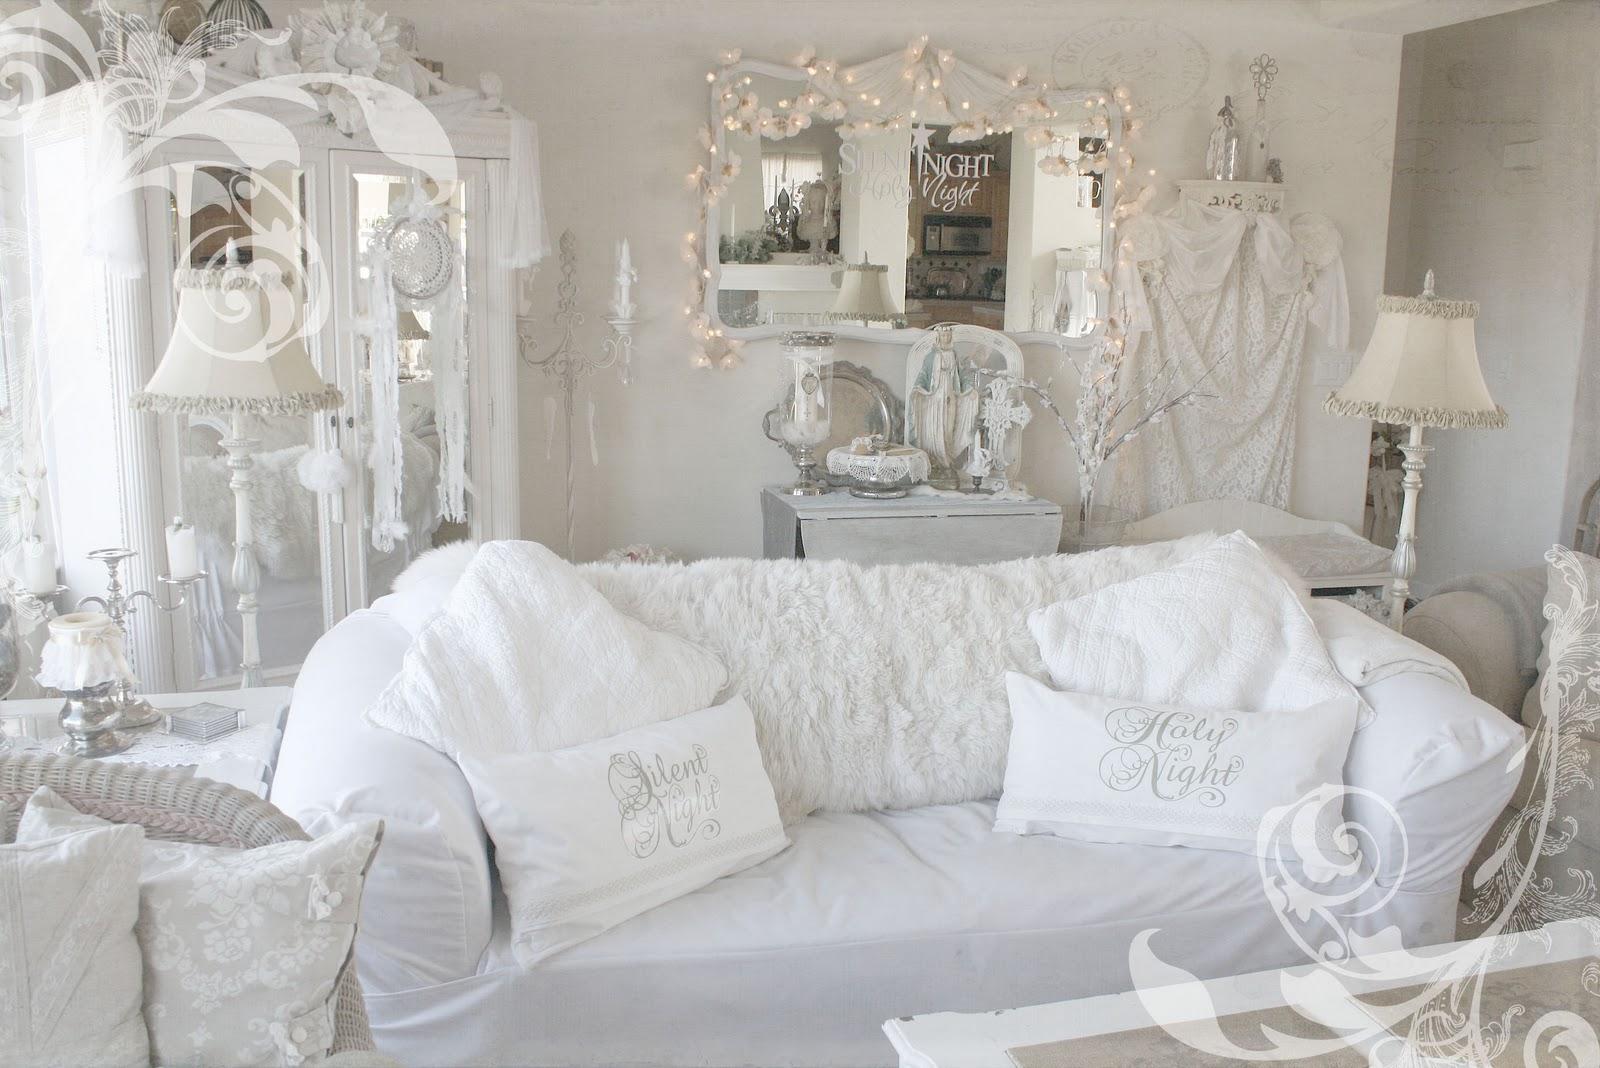 http://3.bp.blogspot.com/-apd0HBa3u6Y/TrwzCwOxR5I/AAAAAAAADuw/9LJhvTpIjmI/s1600/silent-holy+night+pillows+001c+copy.jpg